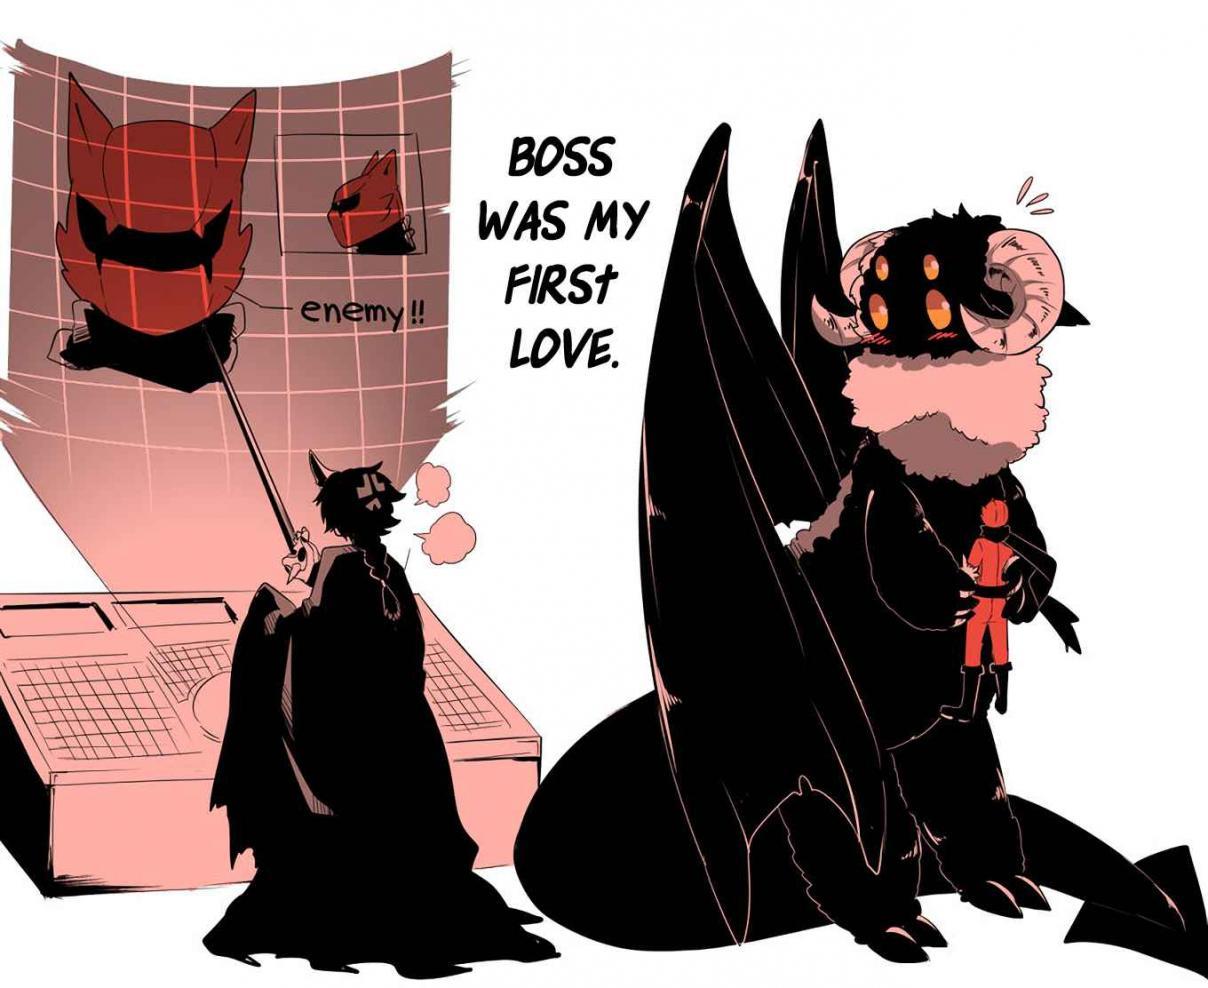 https://img2.nineanime.com/comics/pic2/50/27506/639188/98c2458a2f3407013b6765bde3b71af6.jpg Page 1